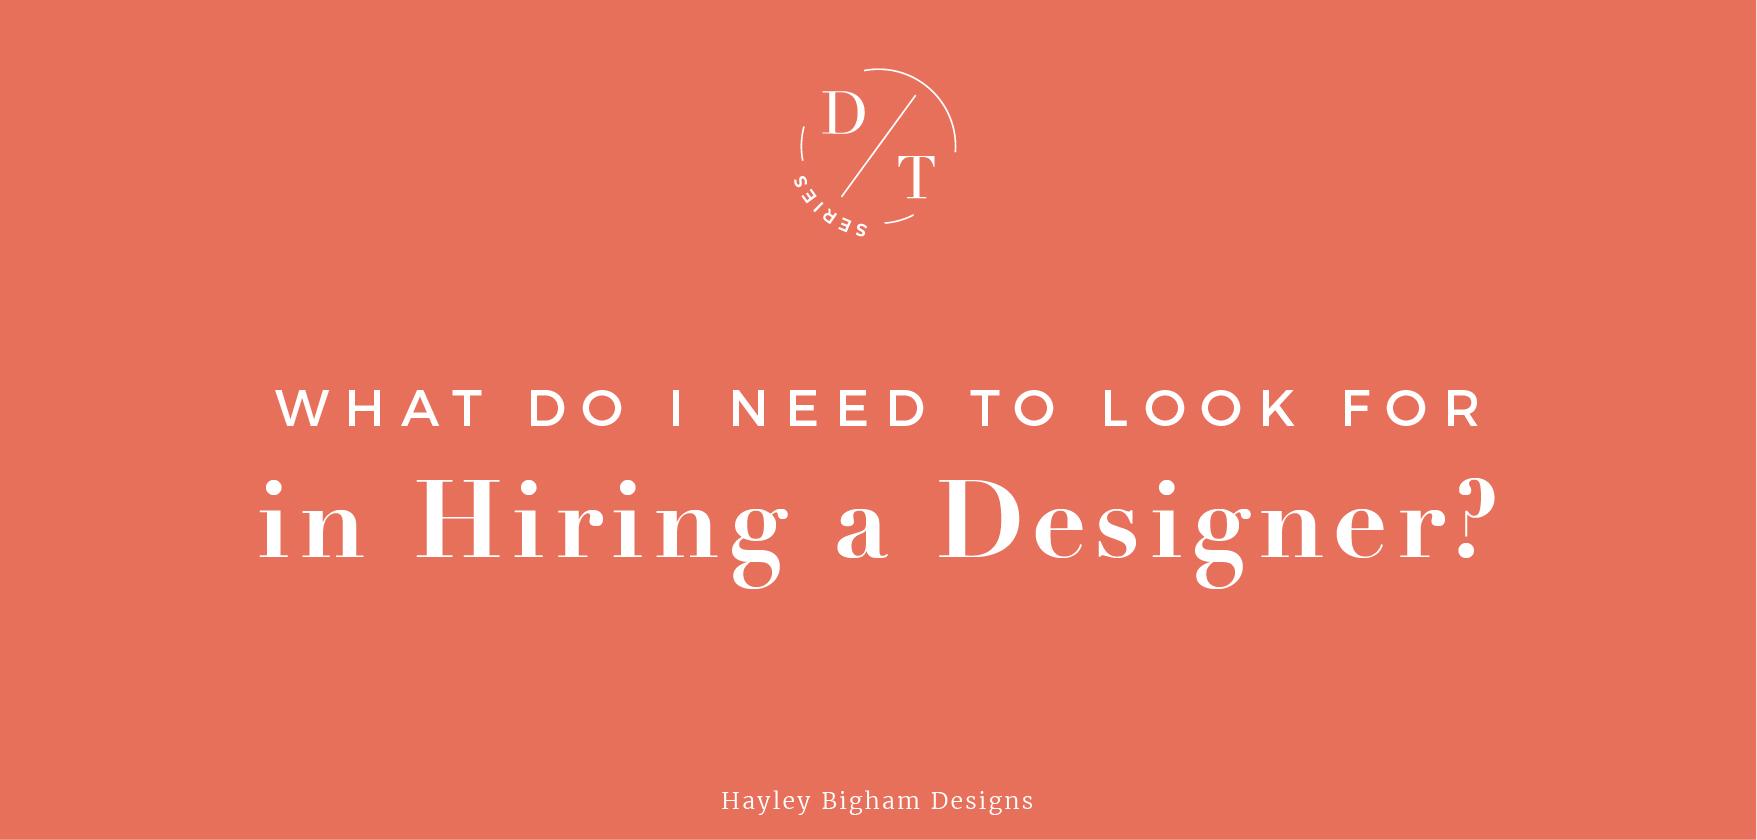 hayley bigham designs-tulsa -how to hire a graphic designer